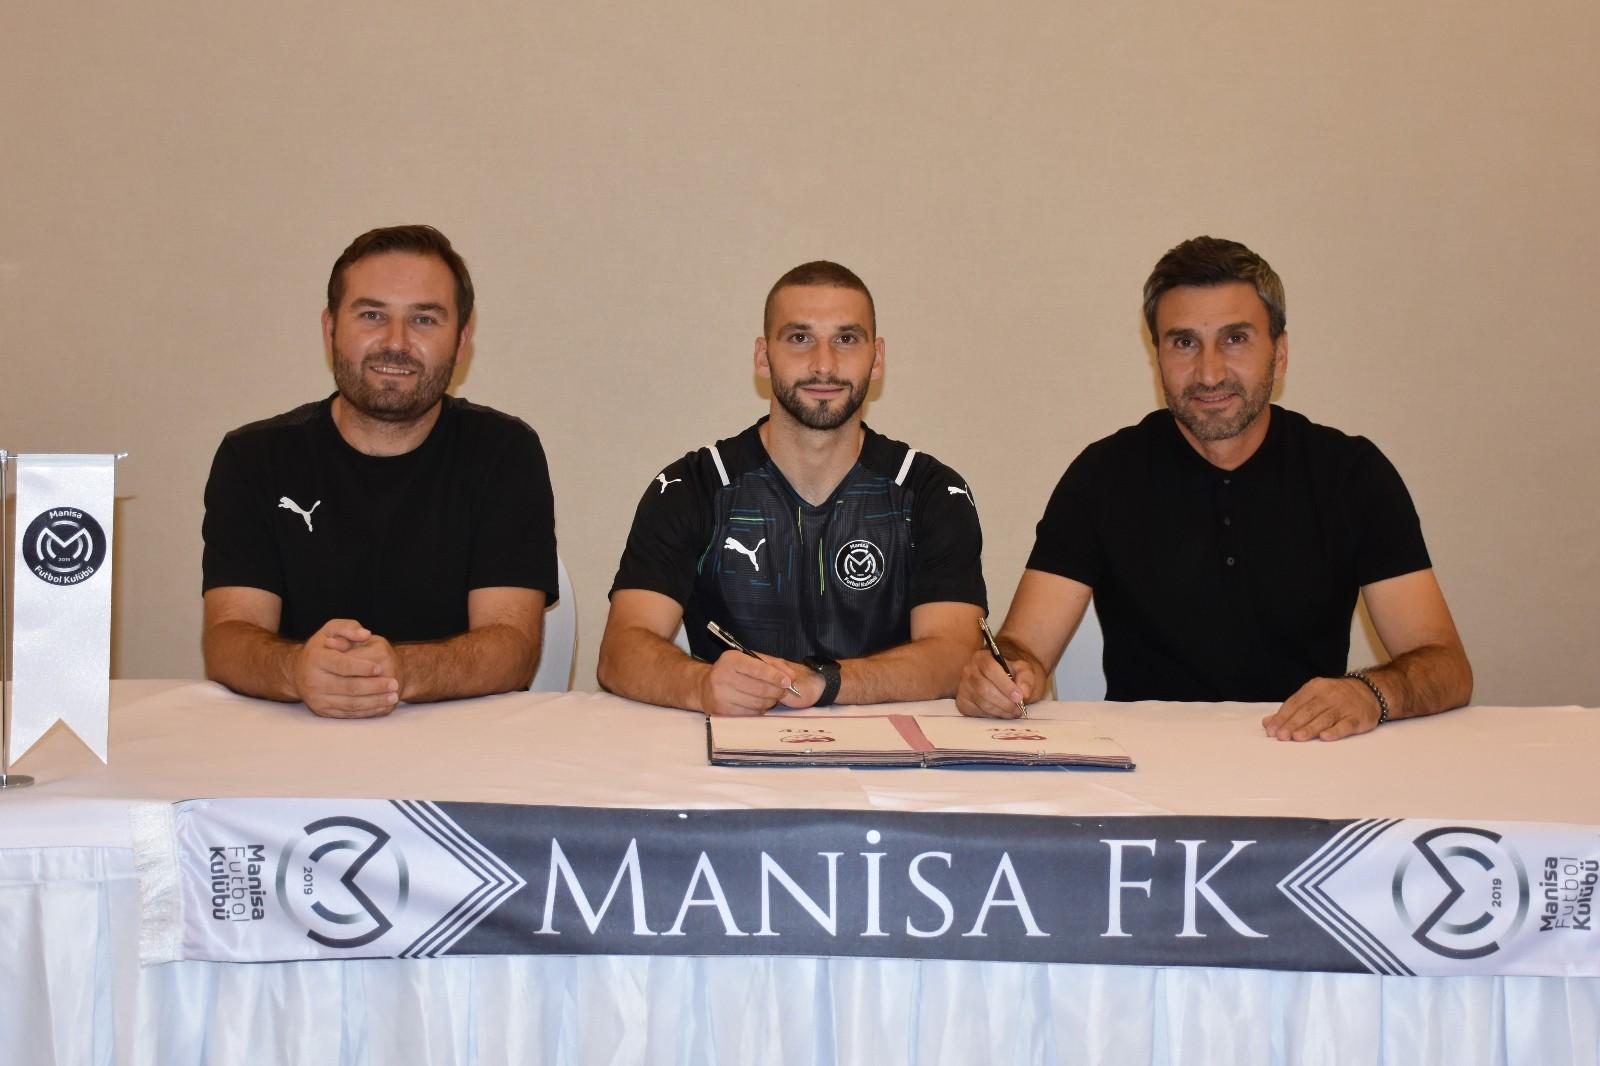 Nino Kouter, Manisa FK'da